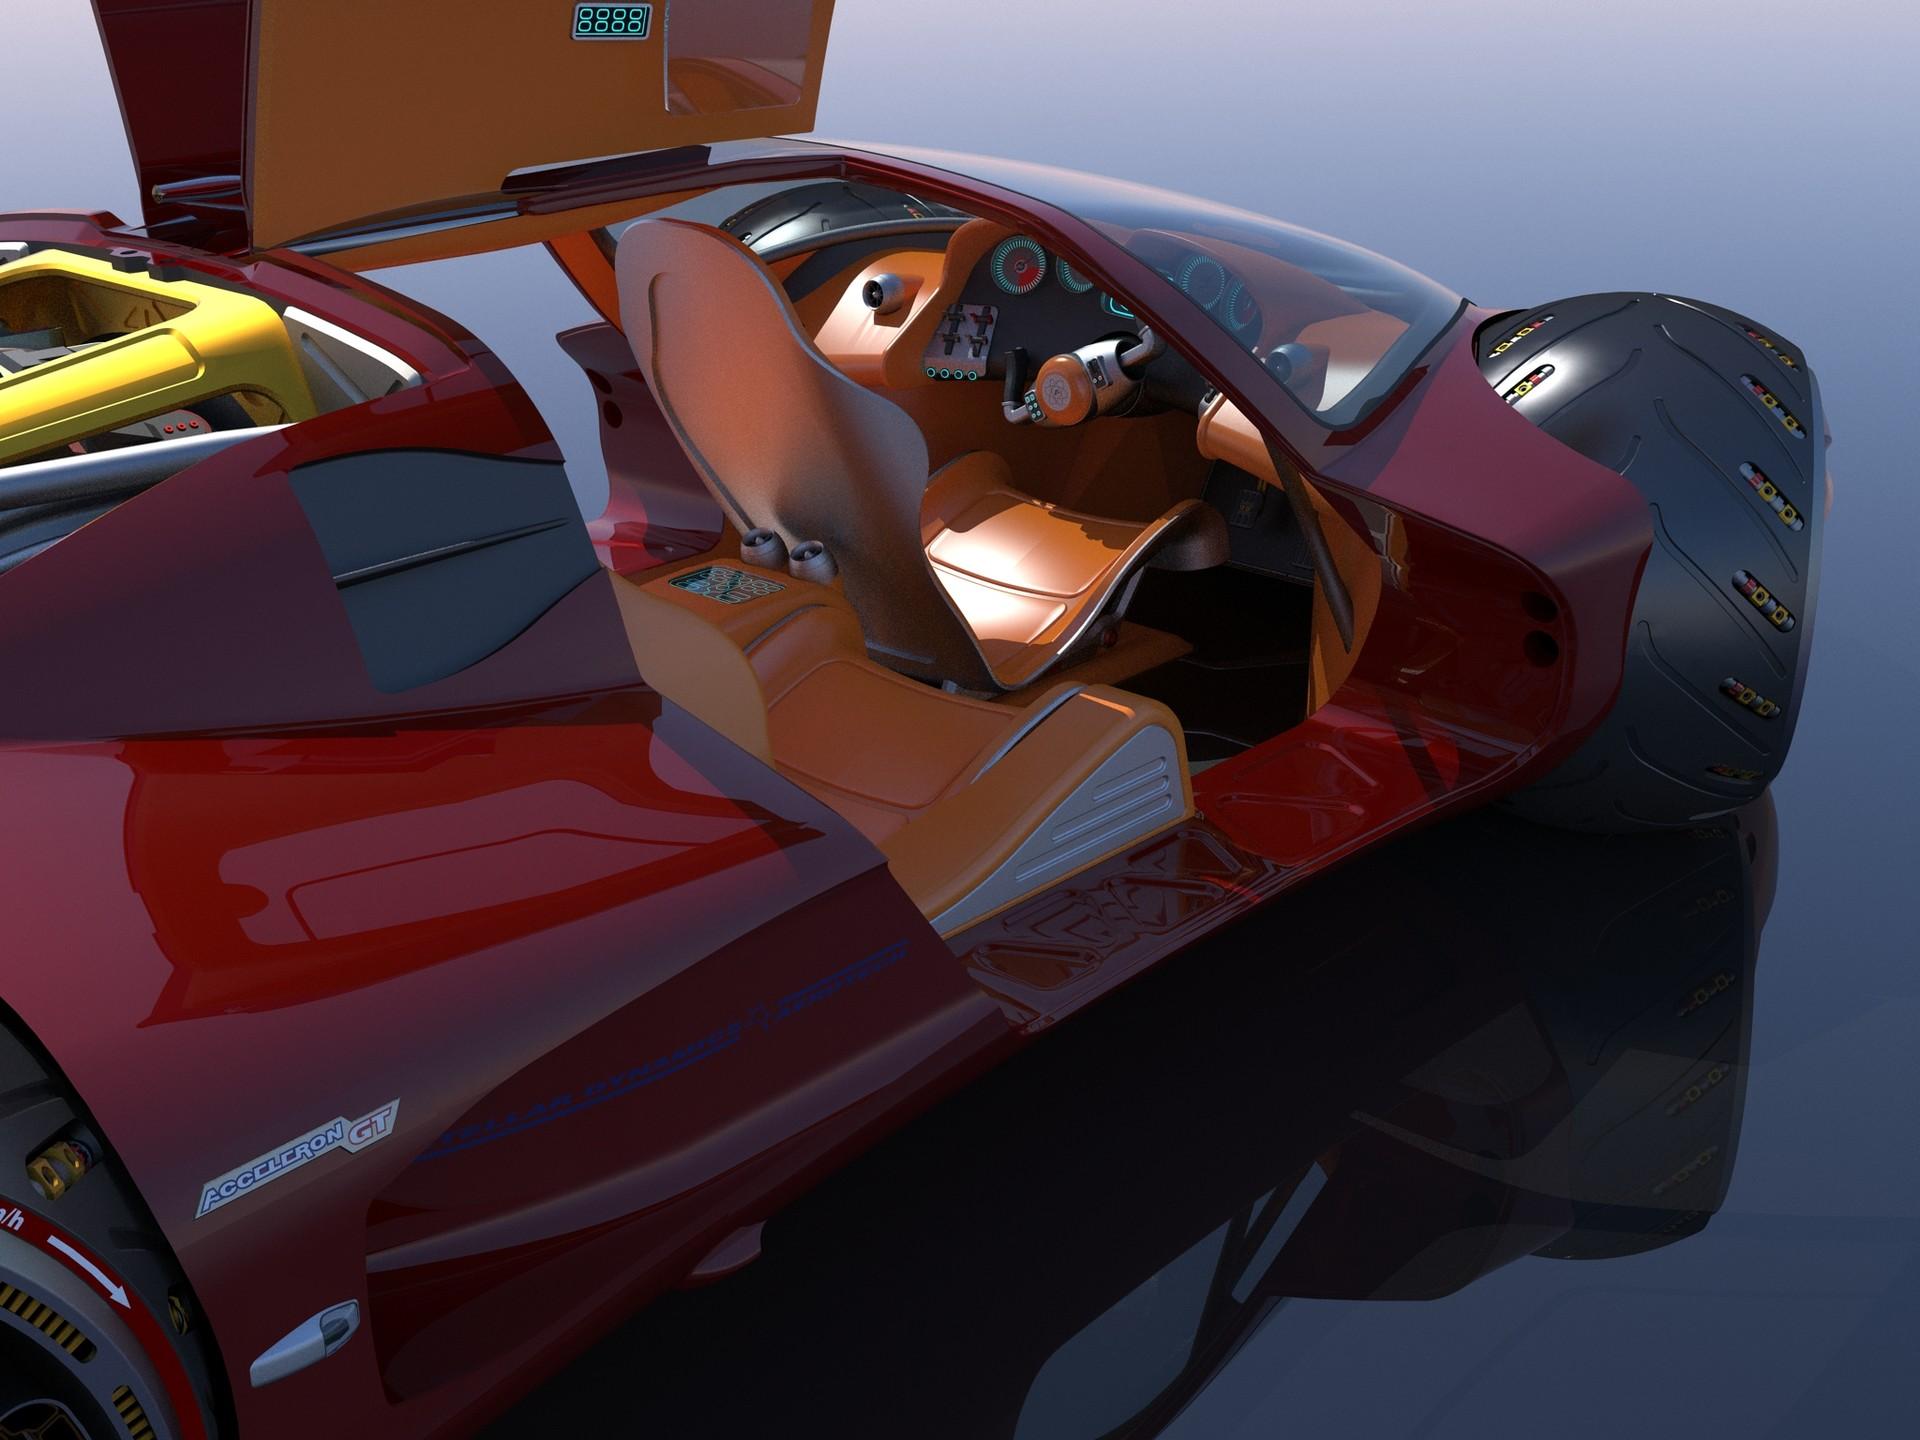 Joachim sverd supercar concept46doors open closeup